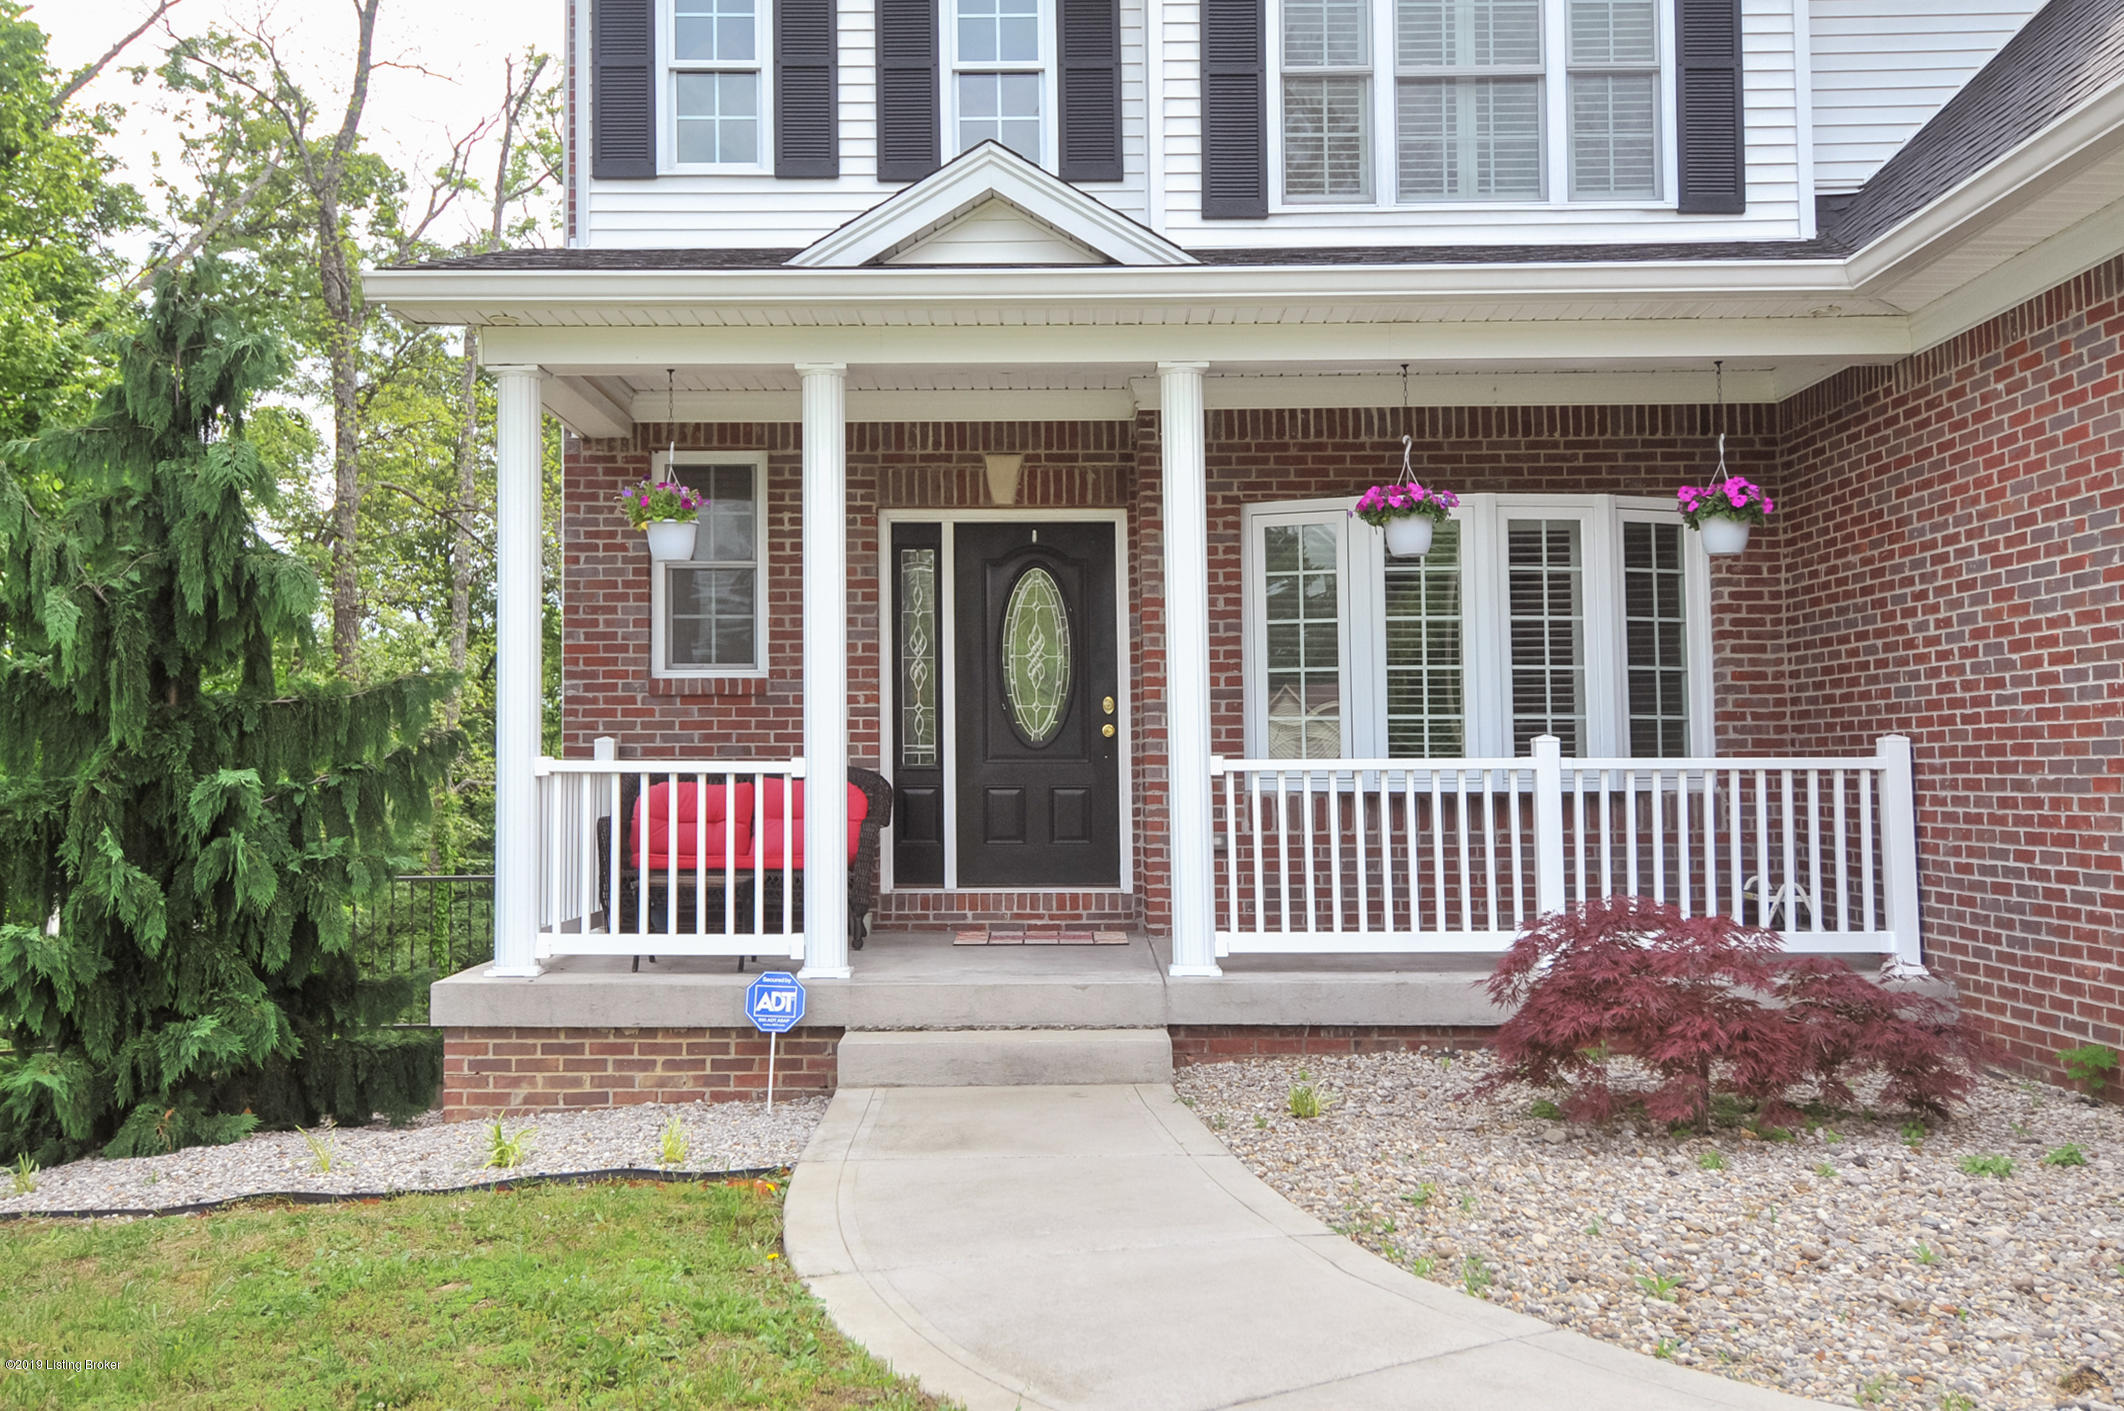 1265 Rams Run Rd, Shepherdsville, Kentucky 40165, 4 Bedrooms Bedrooms, 10 Rooms Rooms,4 BathroomsBathrooms,Residential,For Sale,Rams Run,1532954